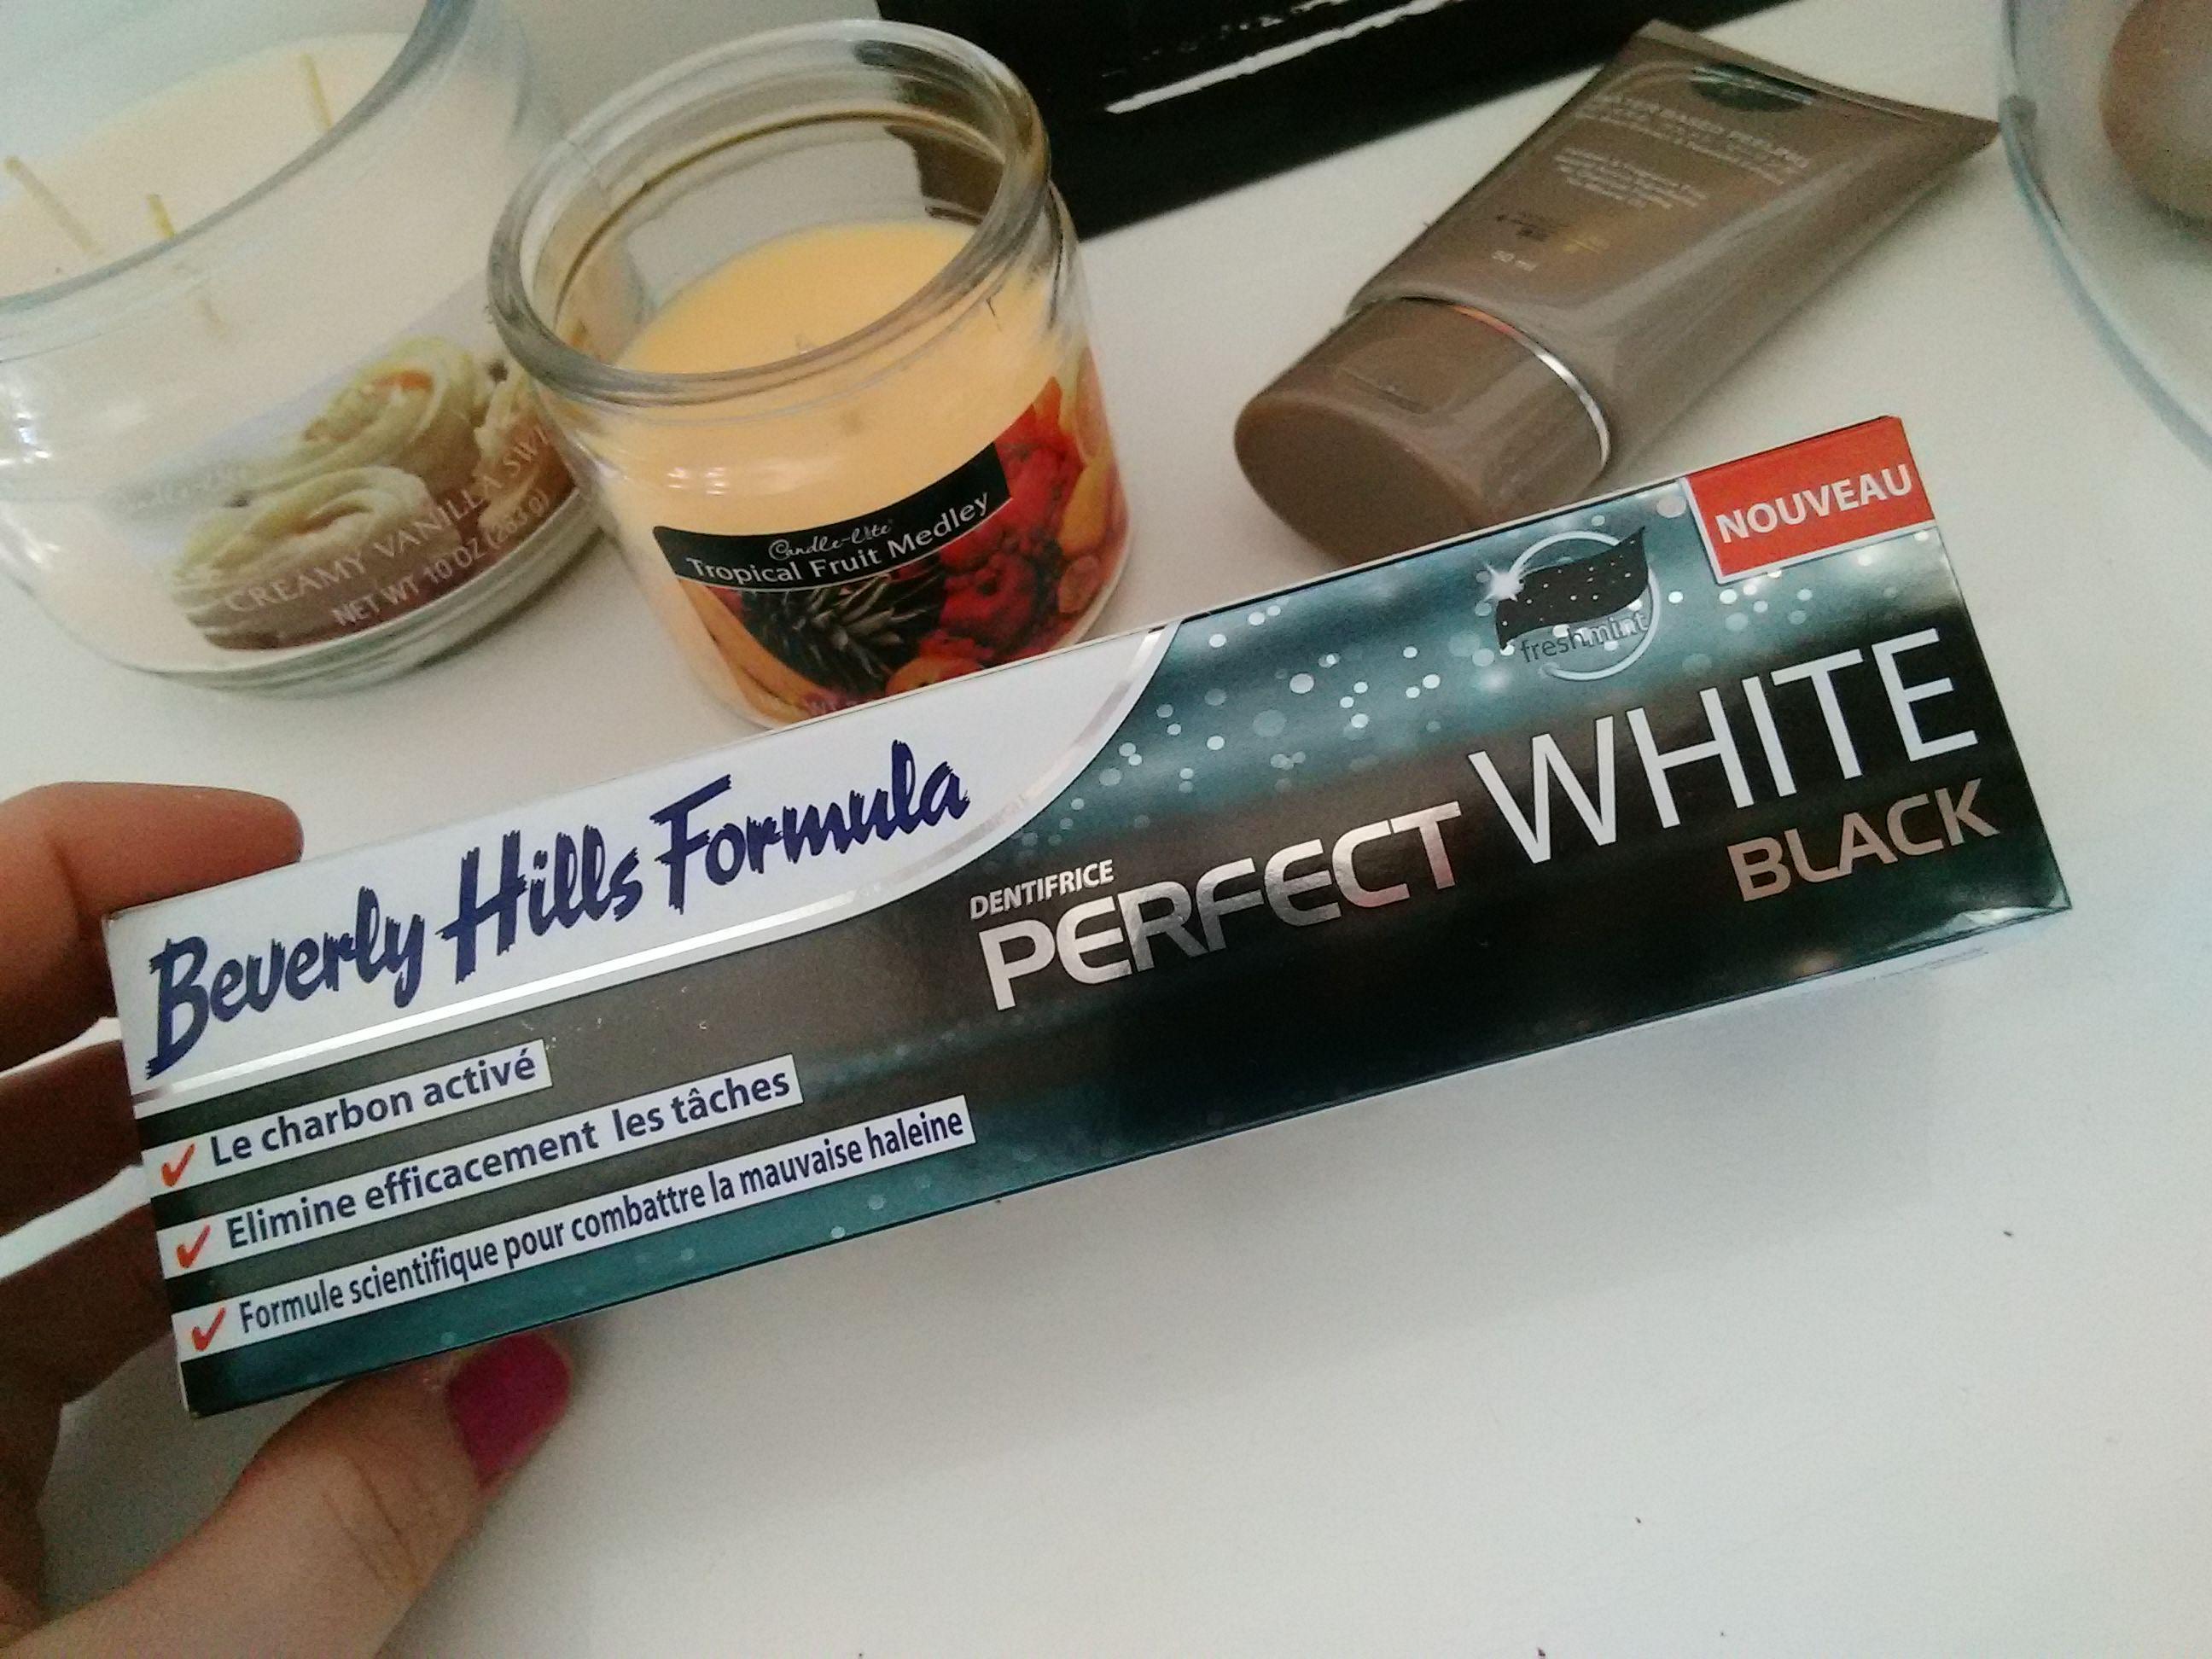 beverly hills formula perfect white black une minute de beaute. Black Bedroom Furniture Sets. Home Design Ideas